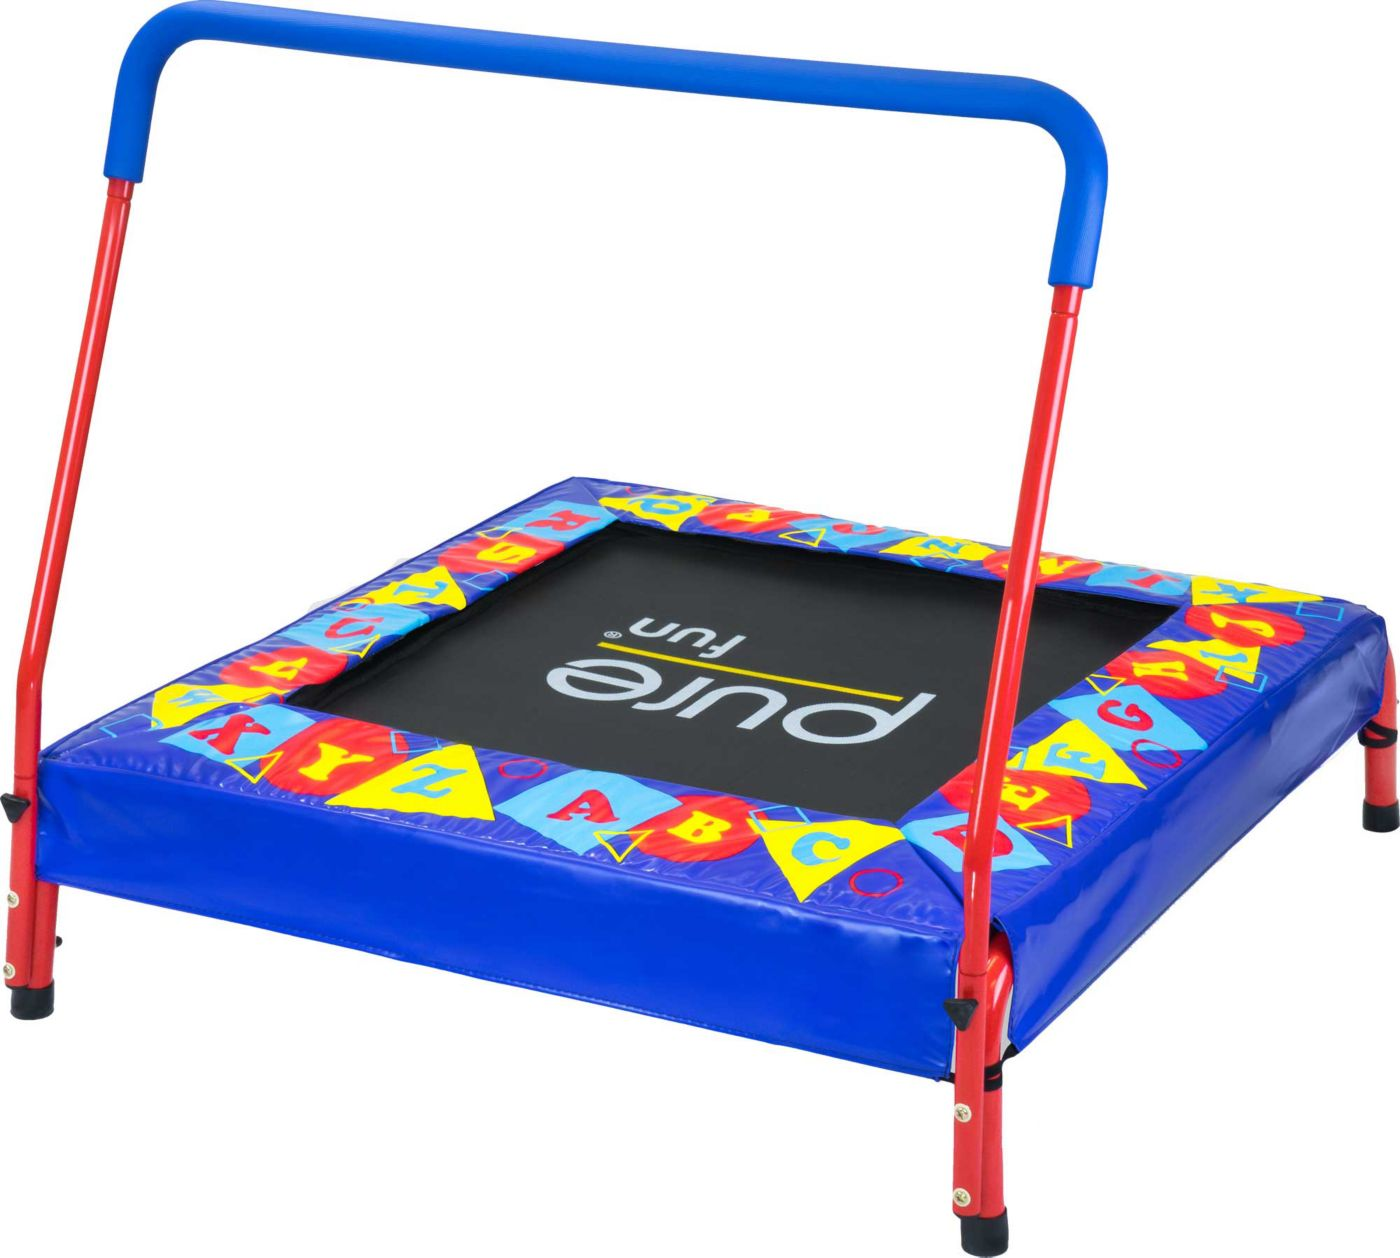 Pure Fun Preschool Jumper Trampoline with Handrail